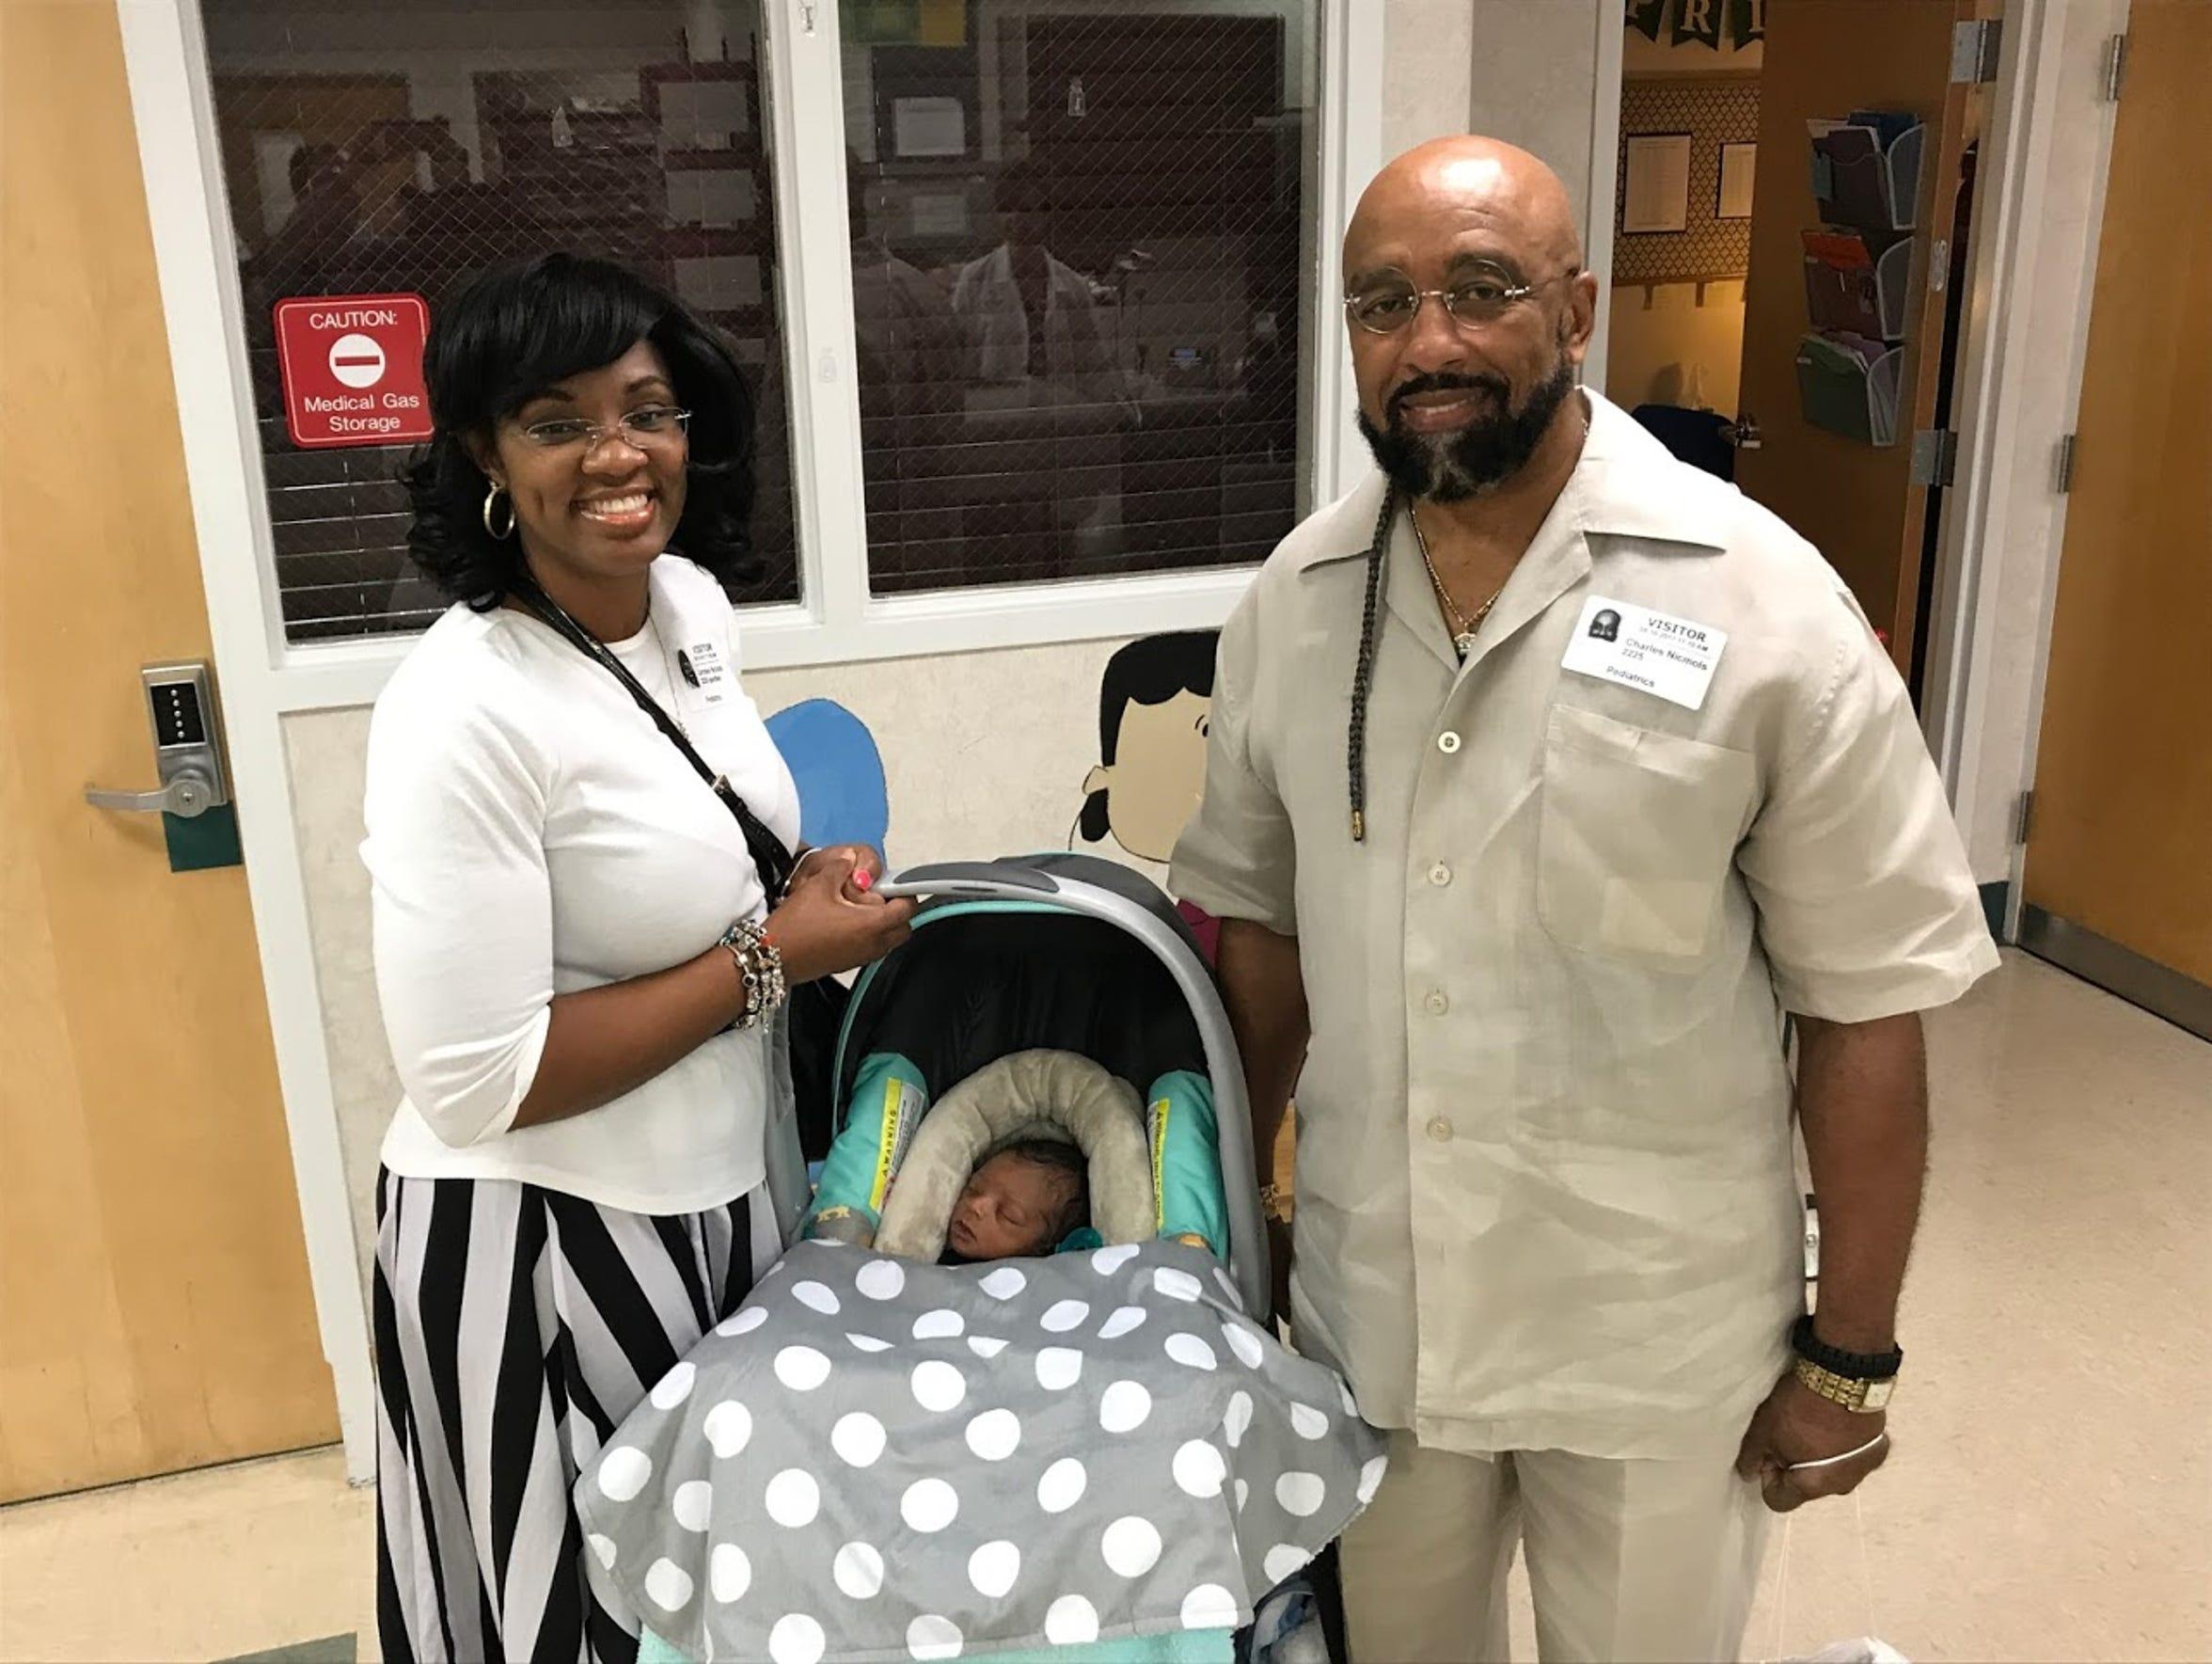 Lorraine and Charles Nichols prepare to leave Tallahassee